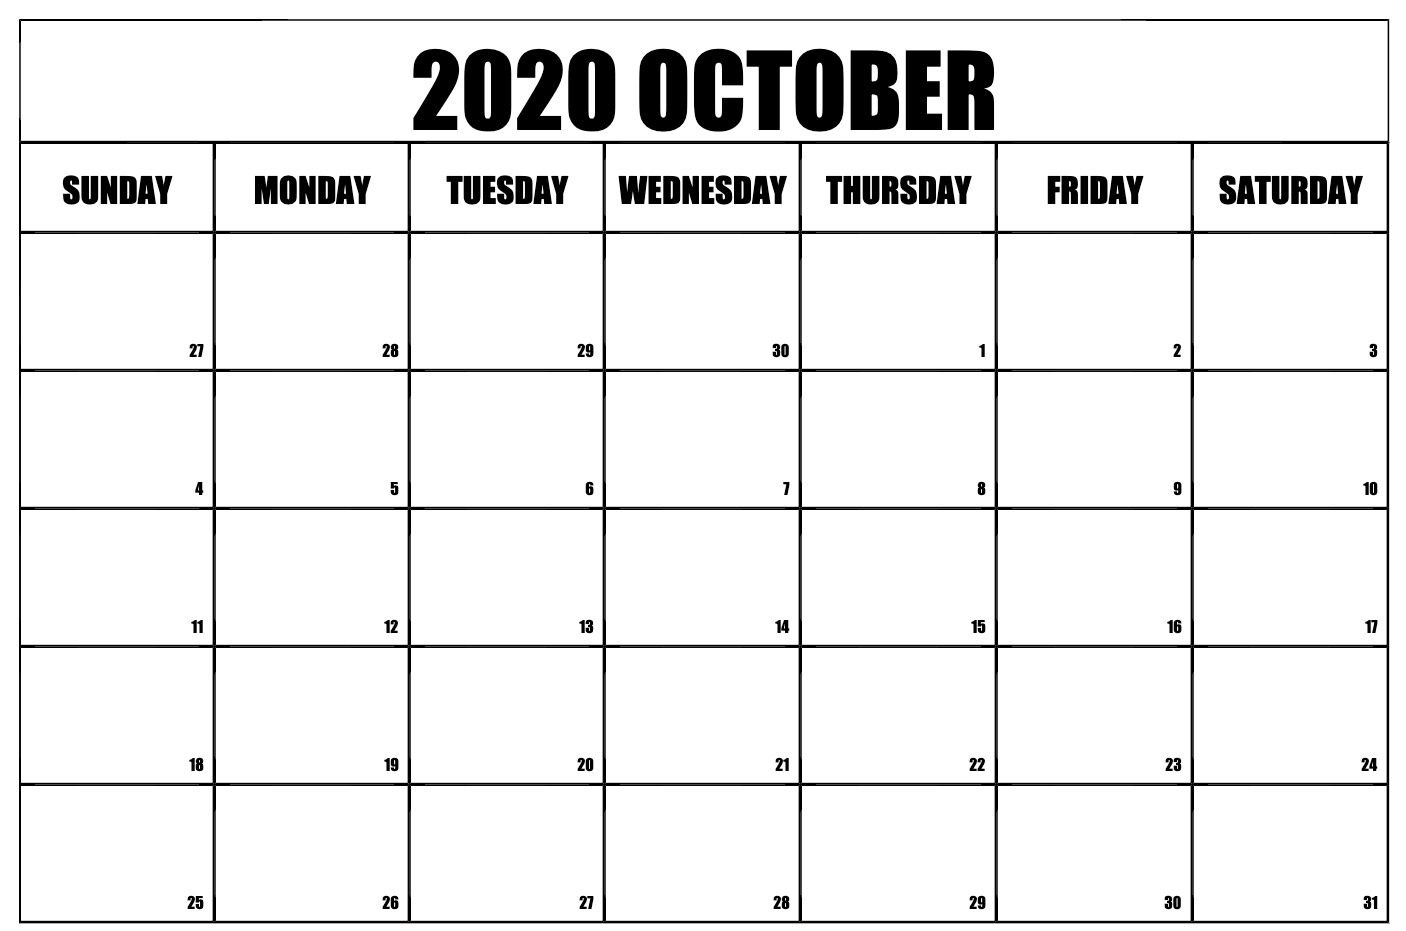 Free Printable Editable October Calendar 2020